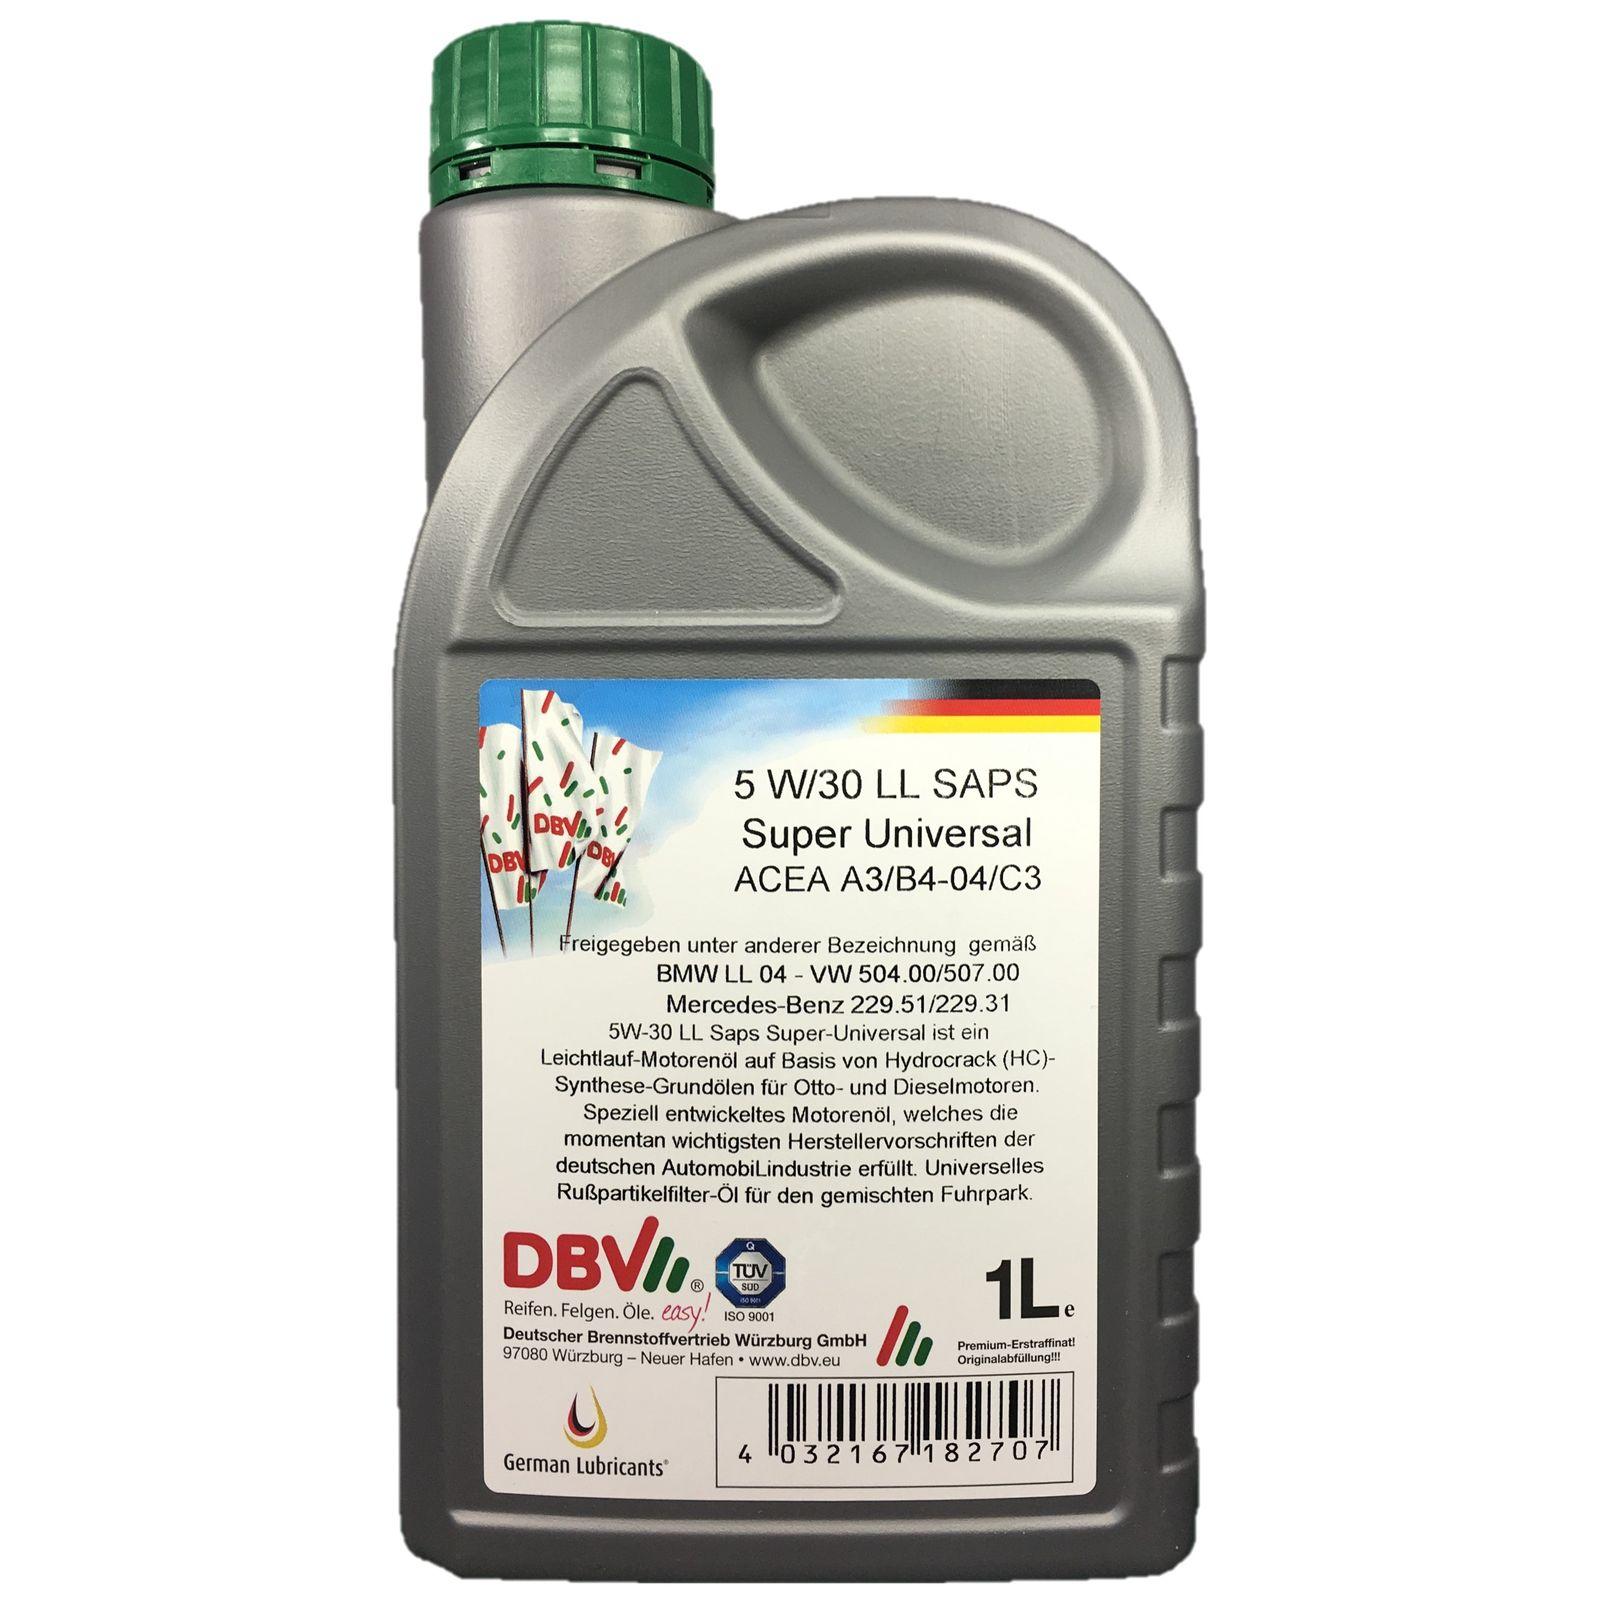 1 Liter DBV Motorenöl 5W-30 LL SAPS Super Universal VW-Longlife 3